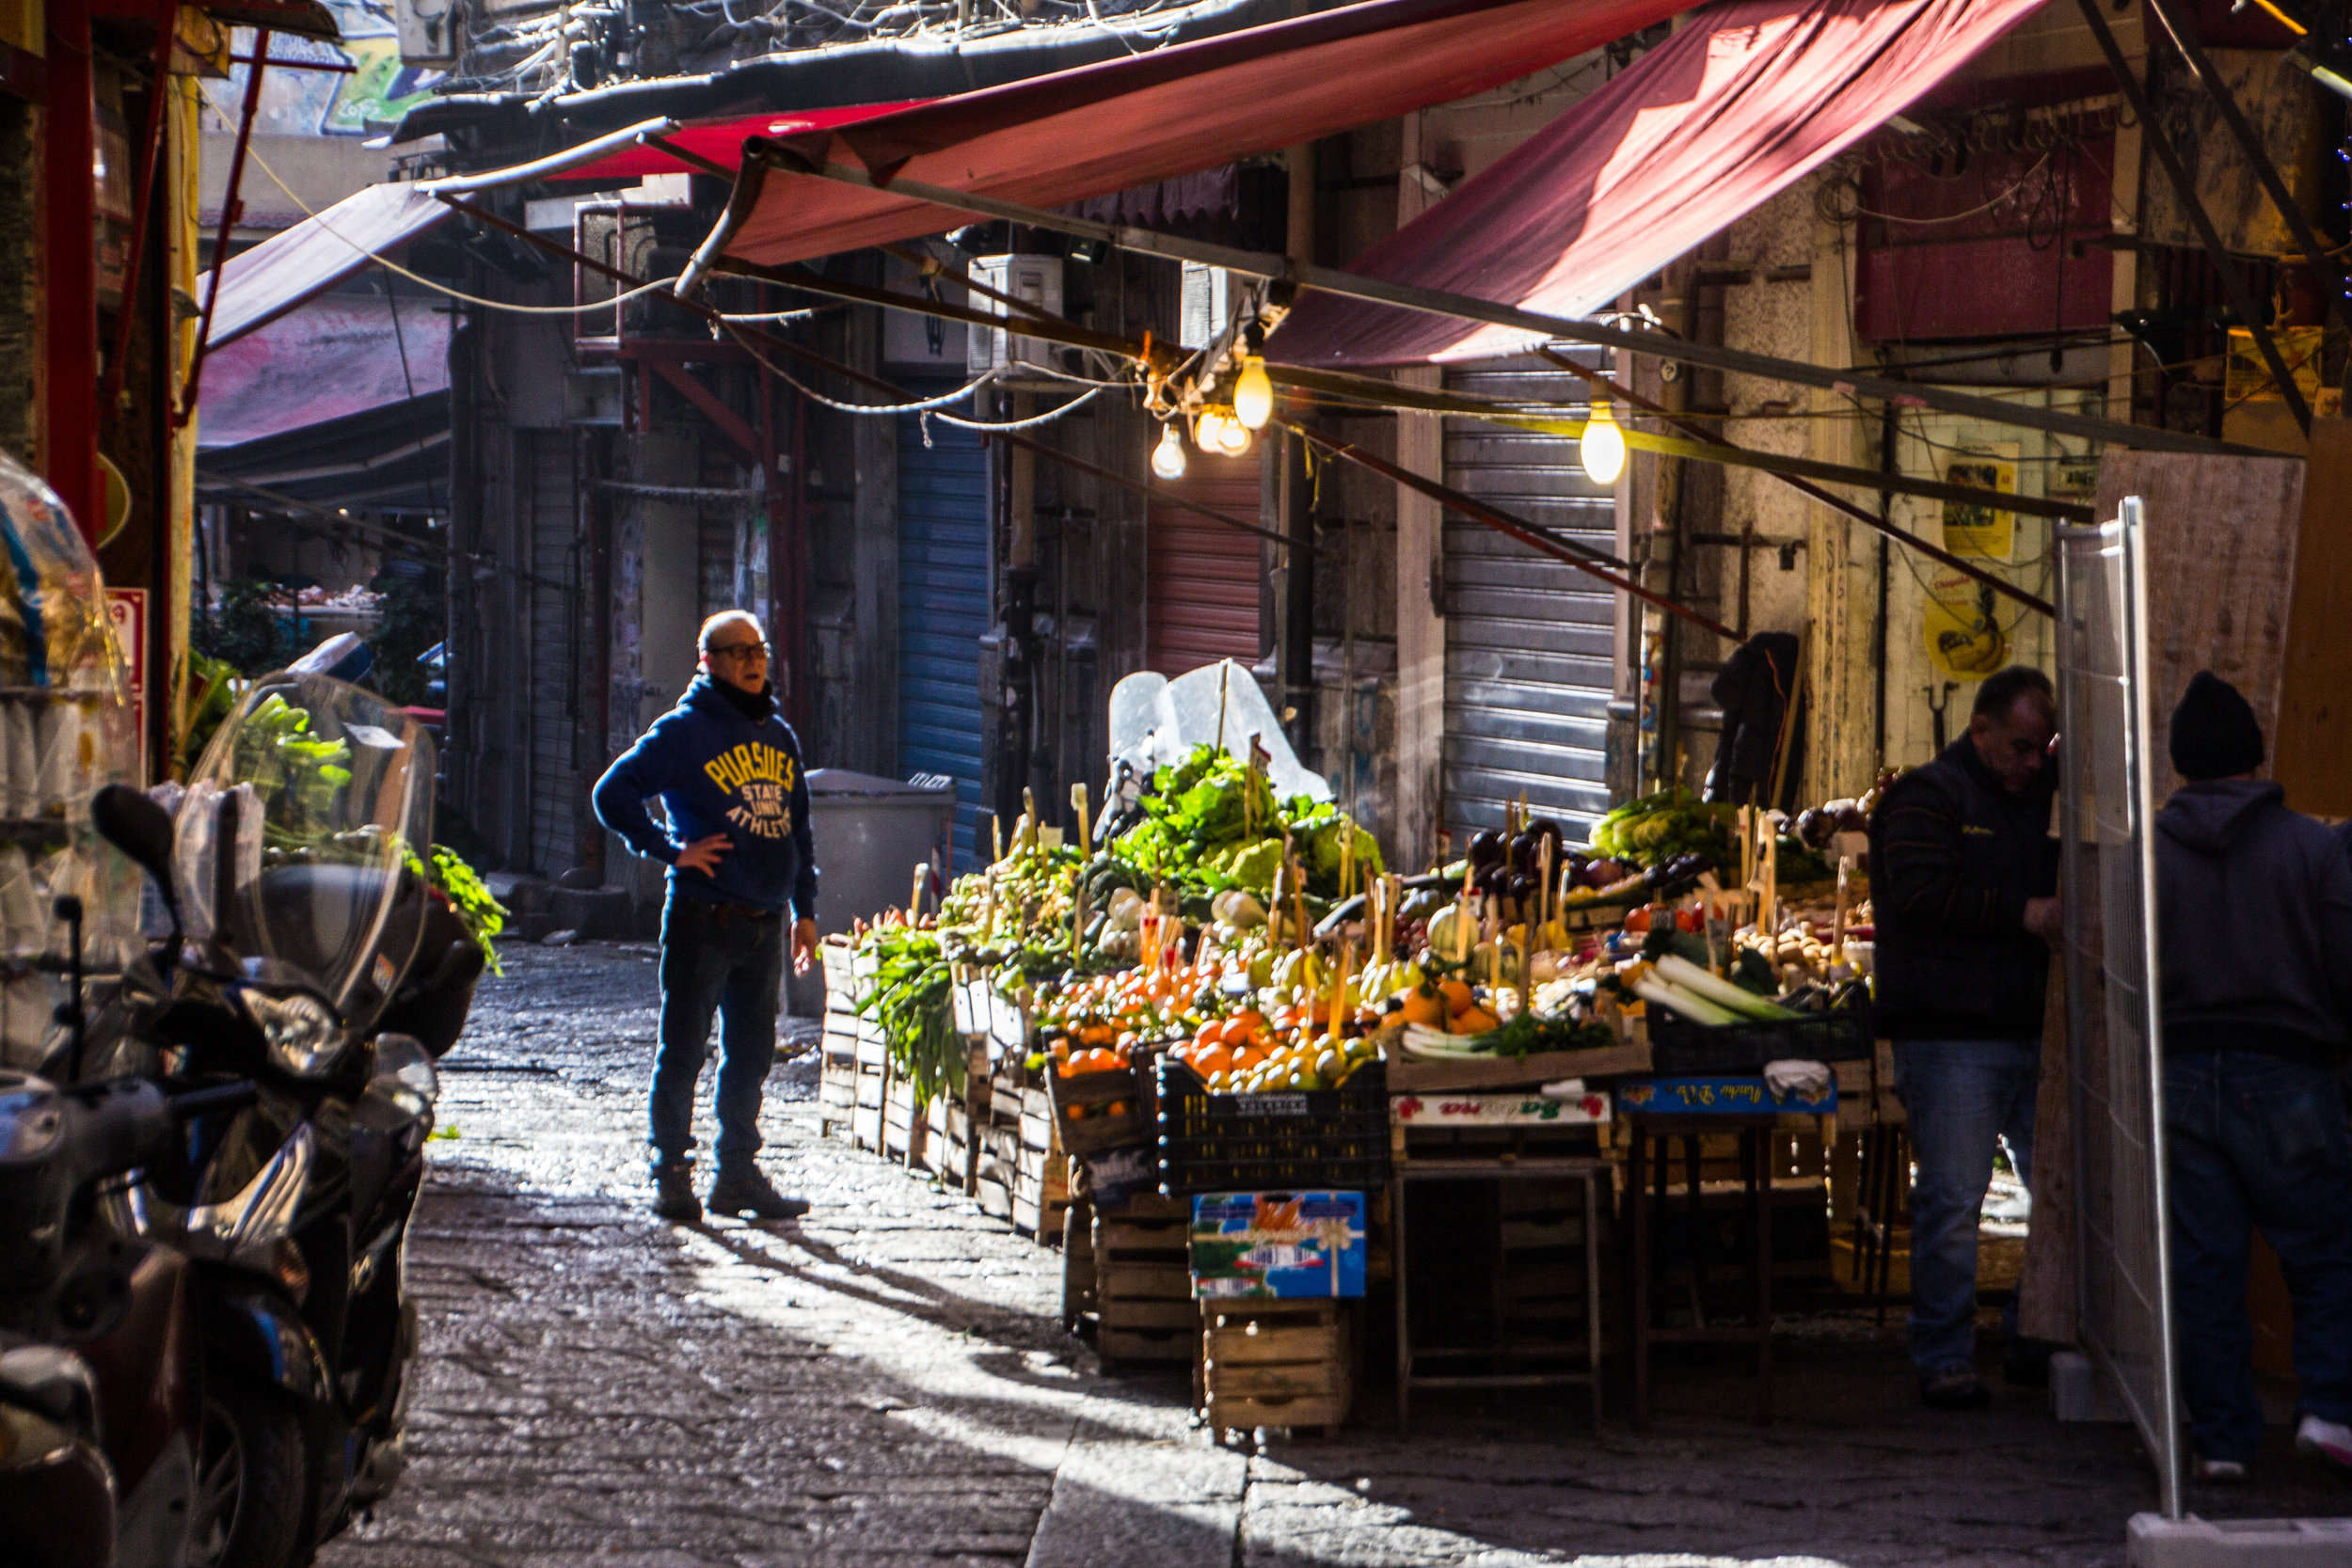 street-photography-palermo-sicily-18.jpg